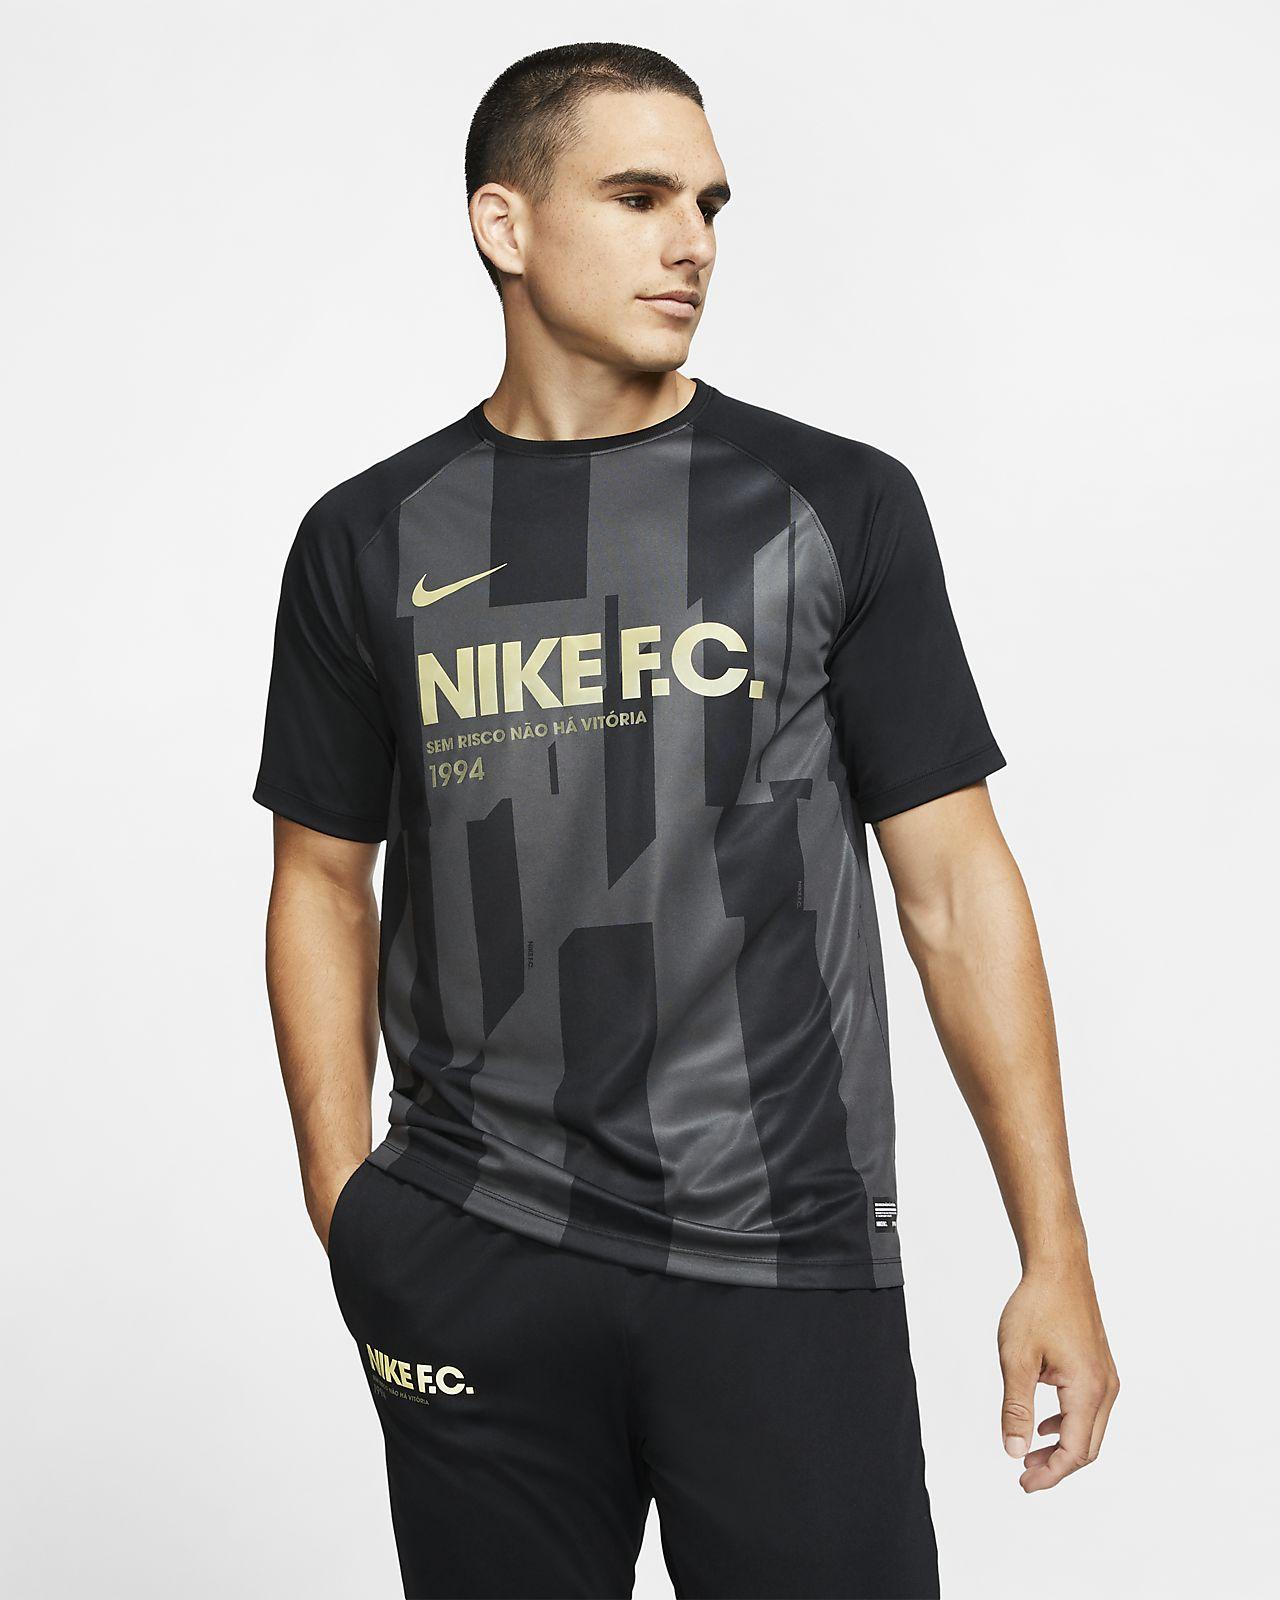 Nike F.C. Camiseta de manga corta - Hombre